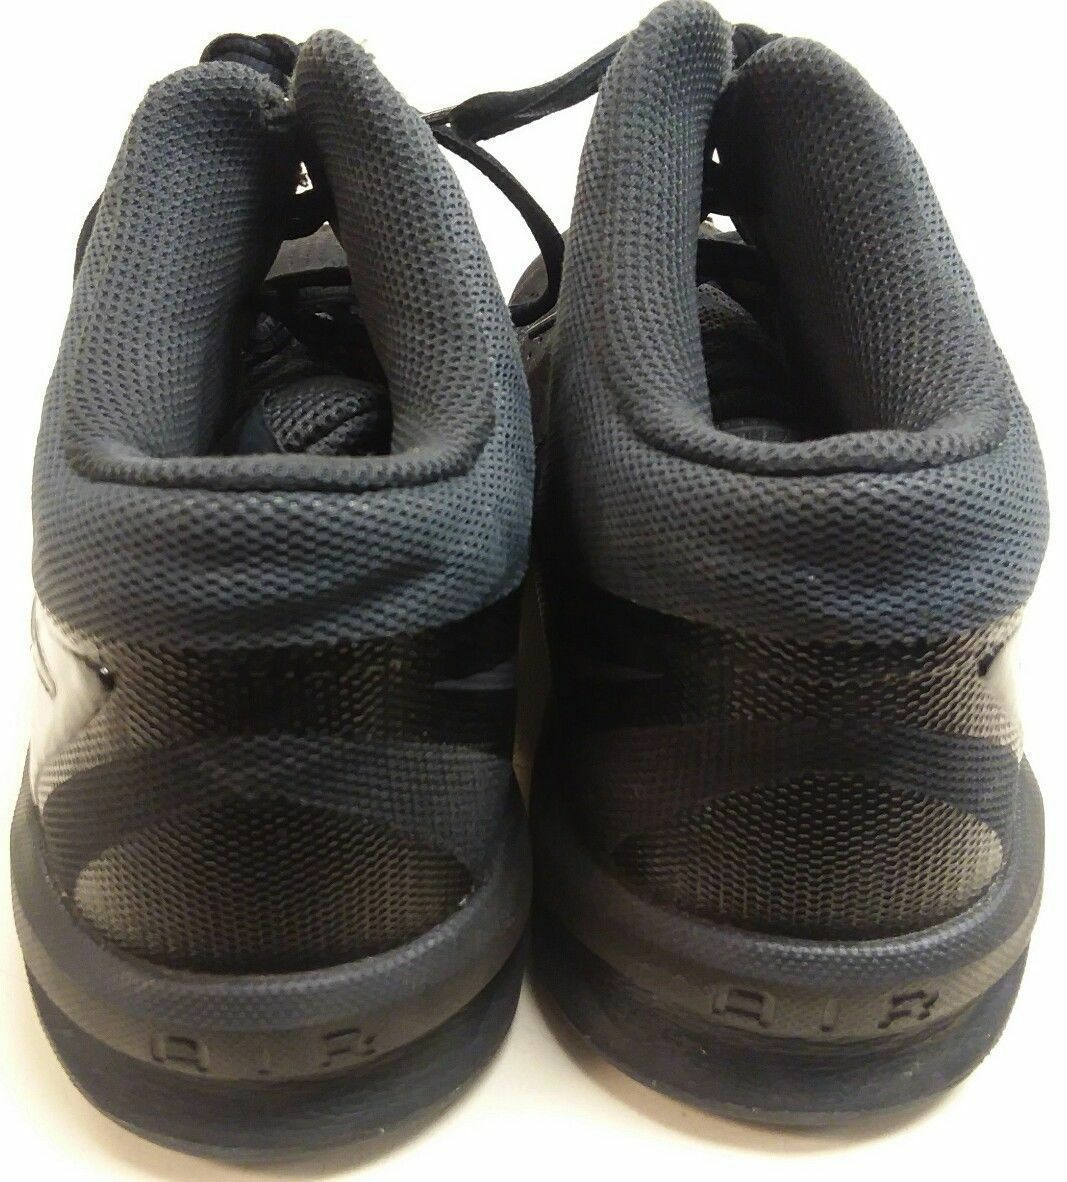 sports shoes b640a ab333 Nike Air Visi Pro VI NBK Mens Size 9.5 Black Basketball Shoes Good Condition